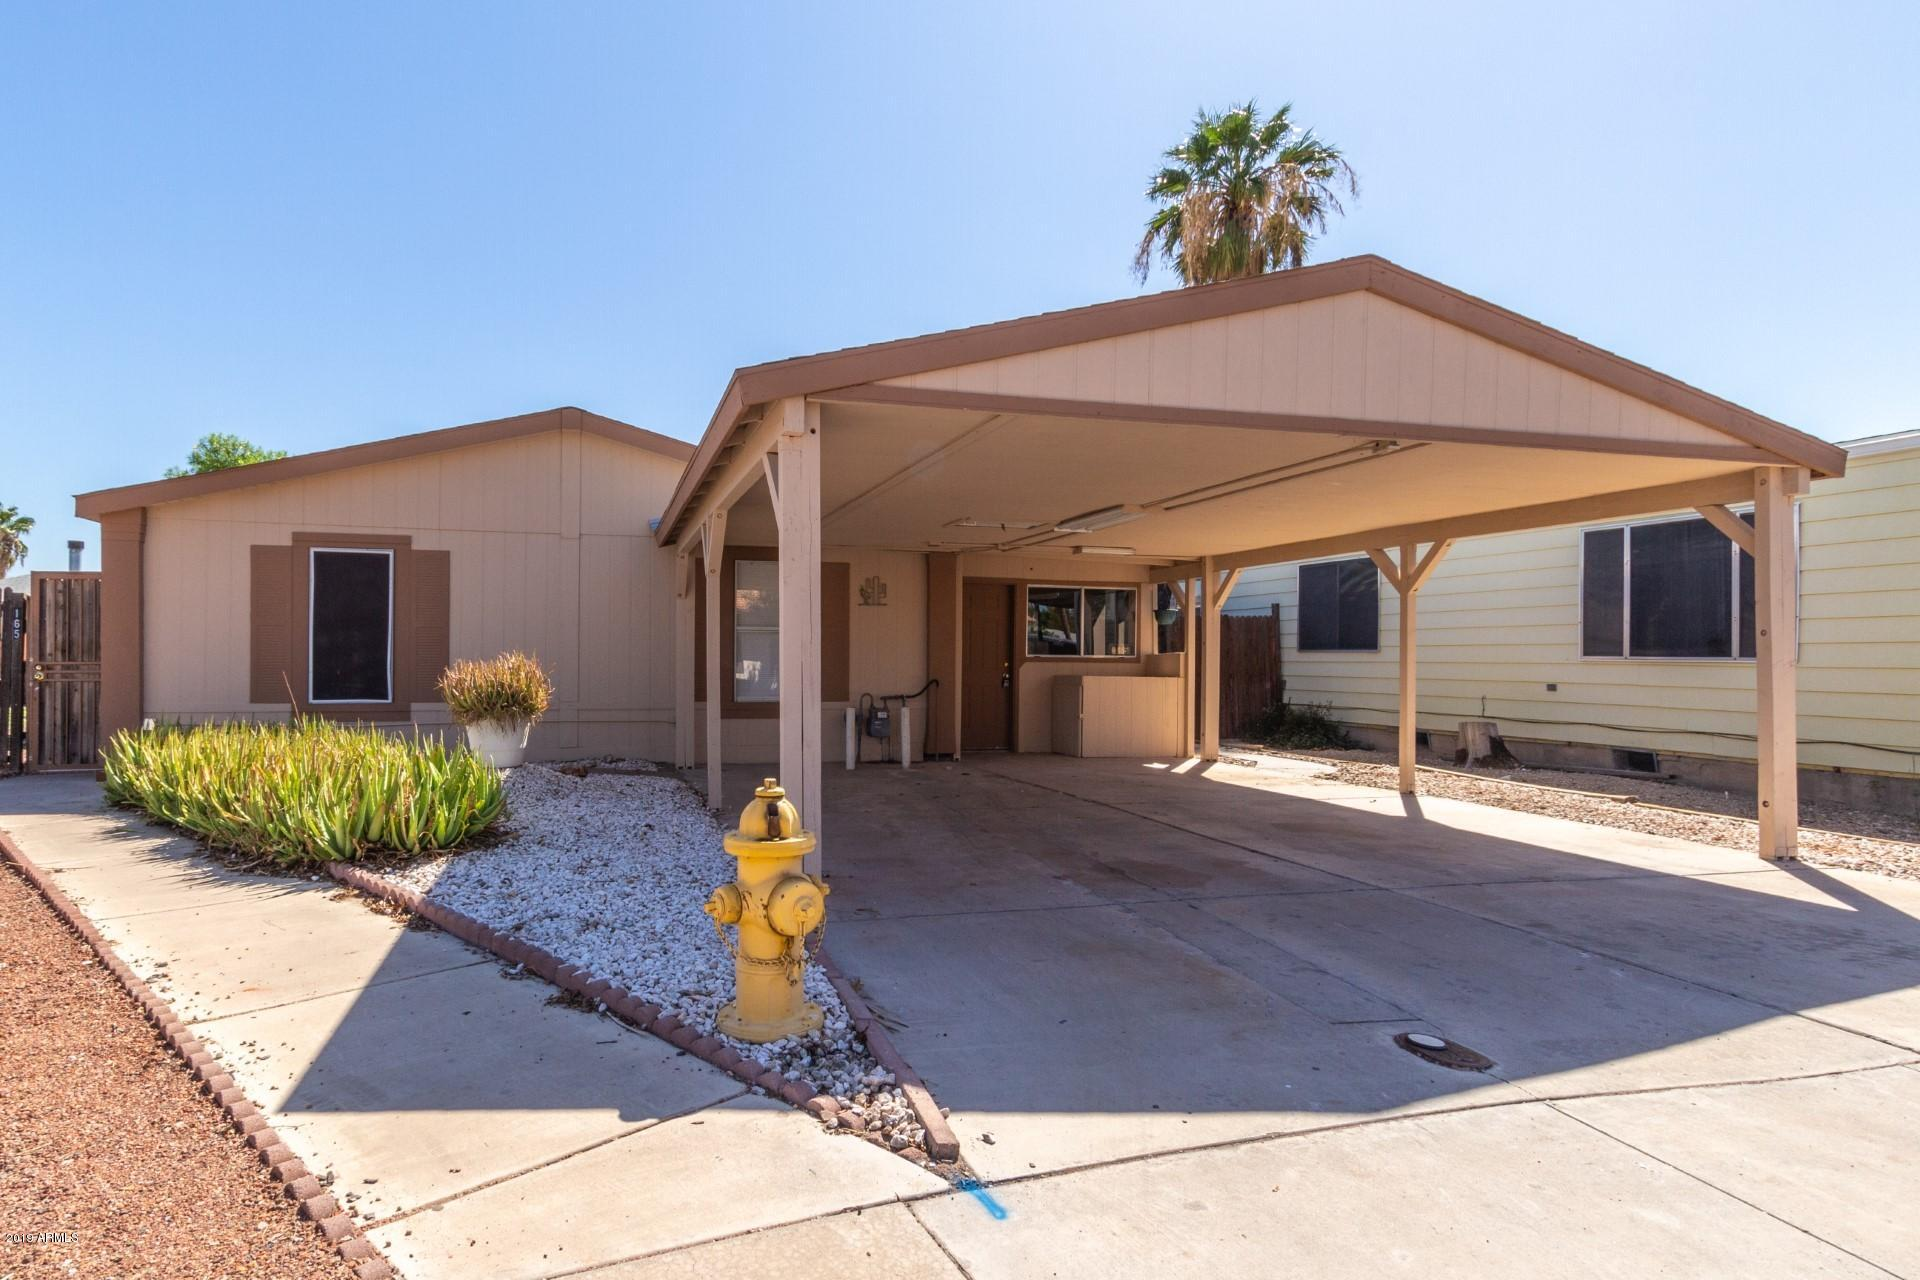 Photo of 11275 N 99th Avenue #165, Peoria, AZ 85345